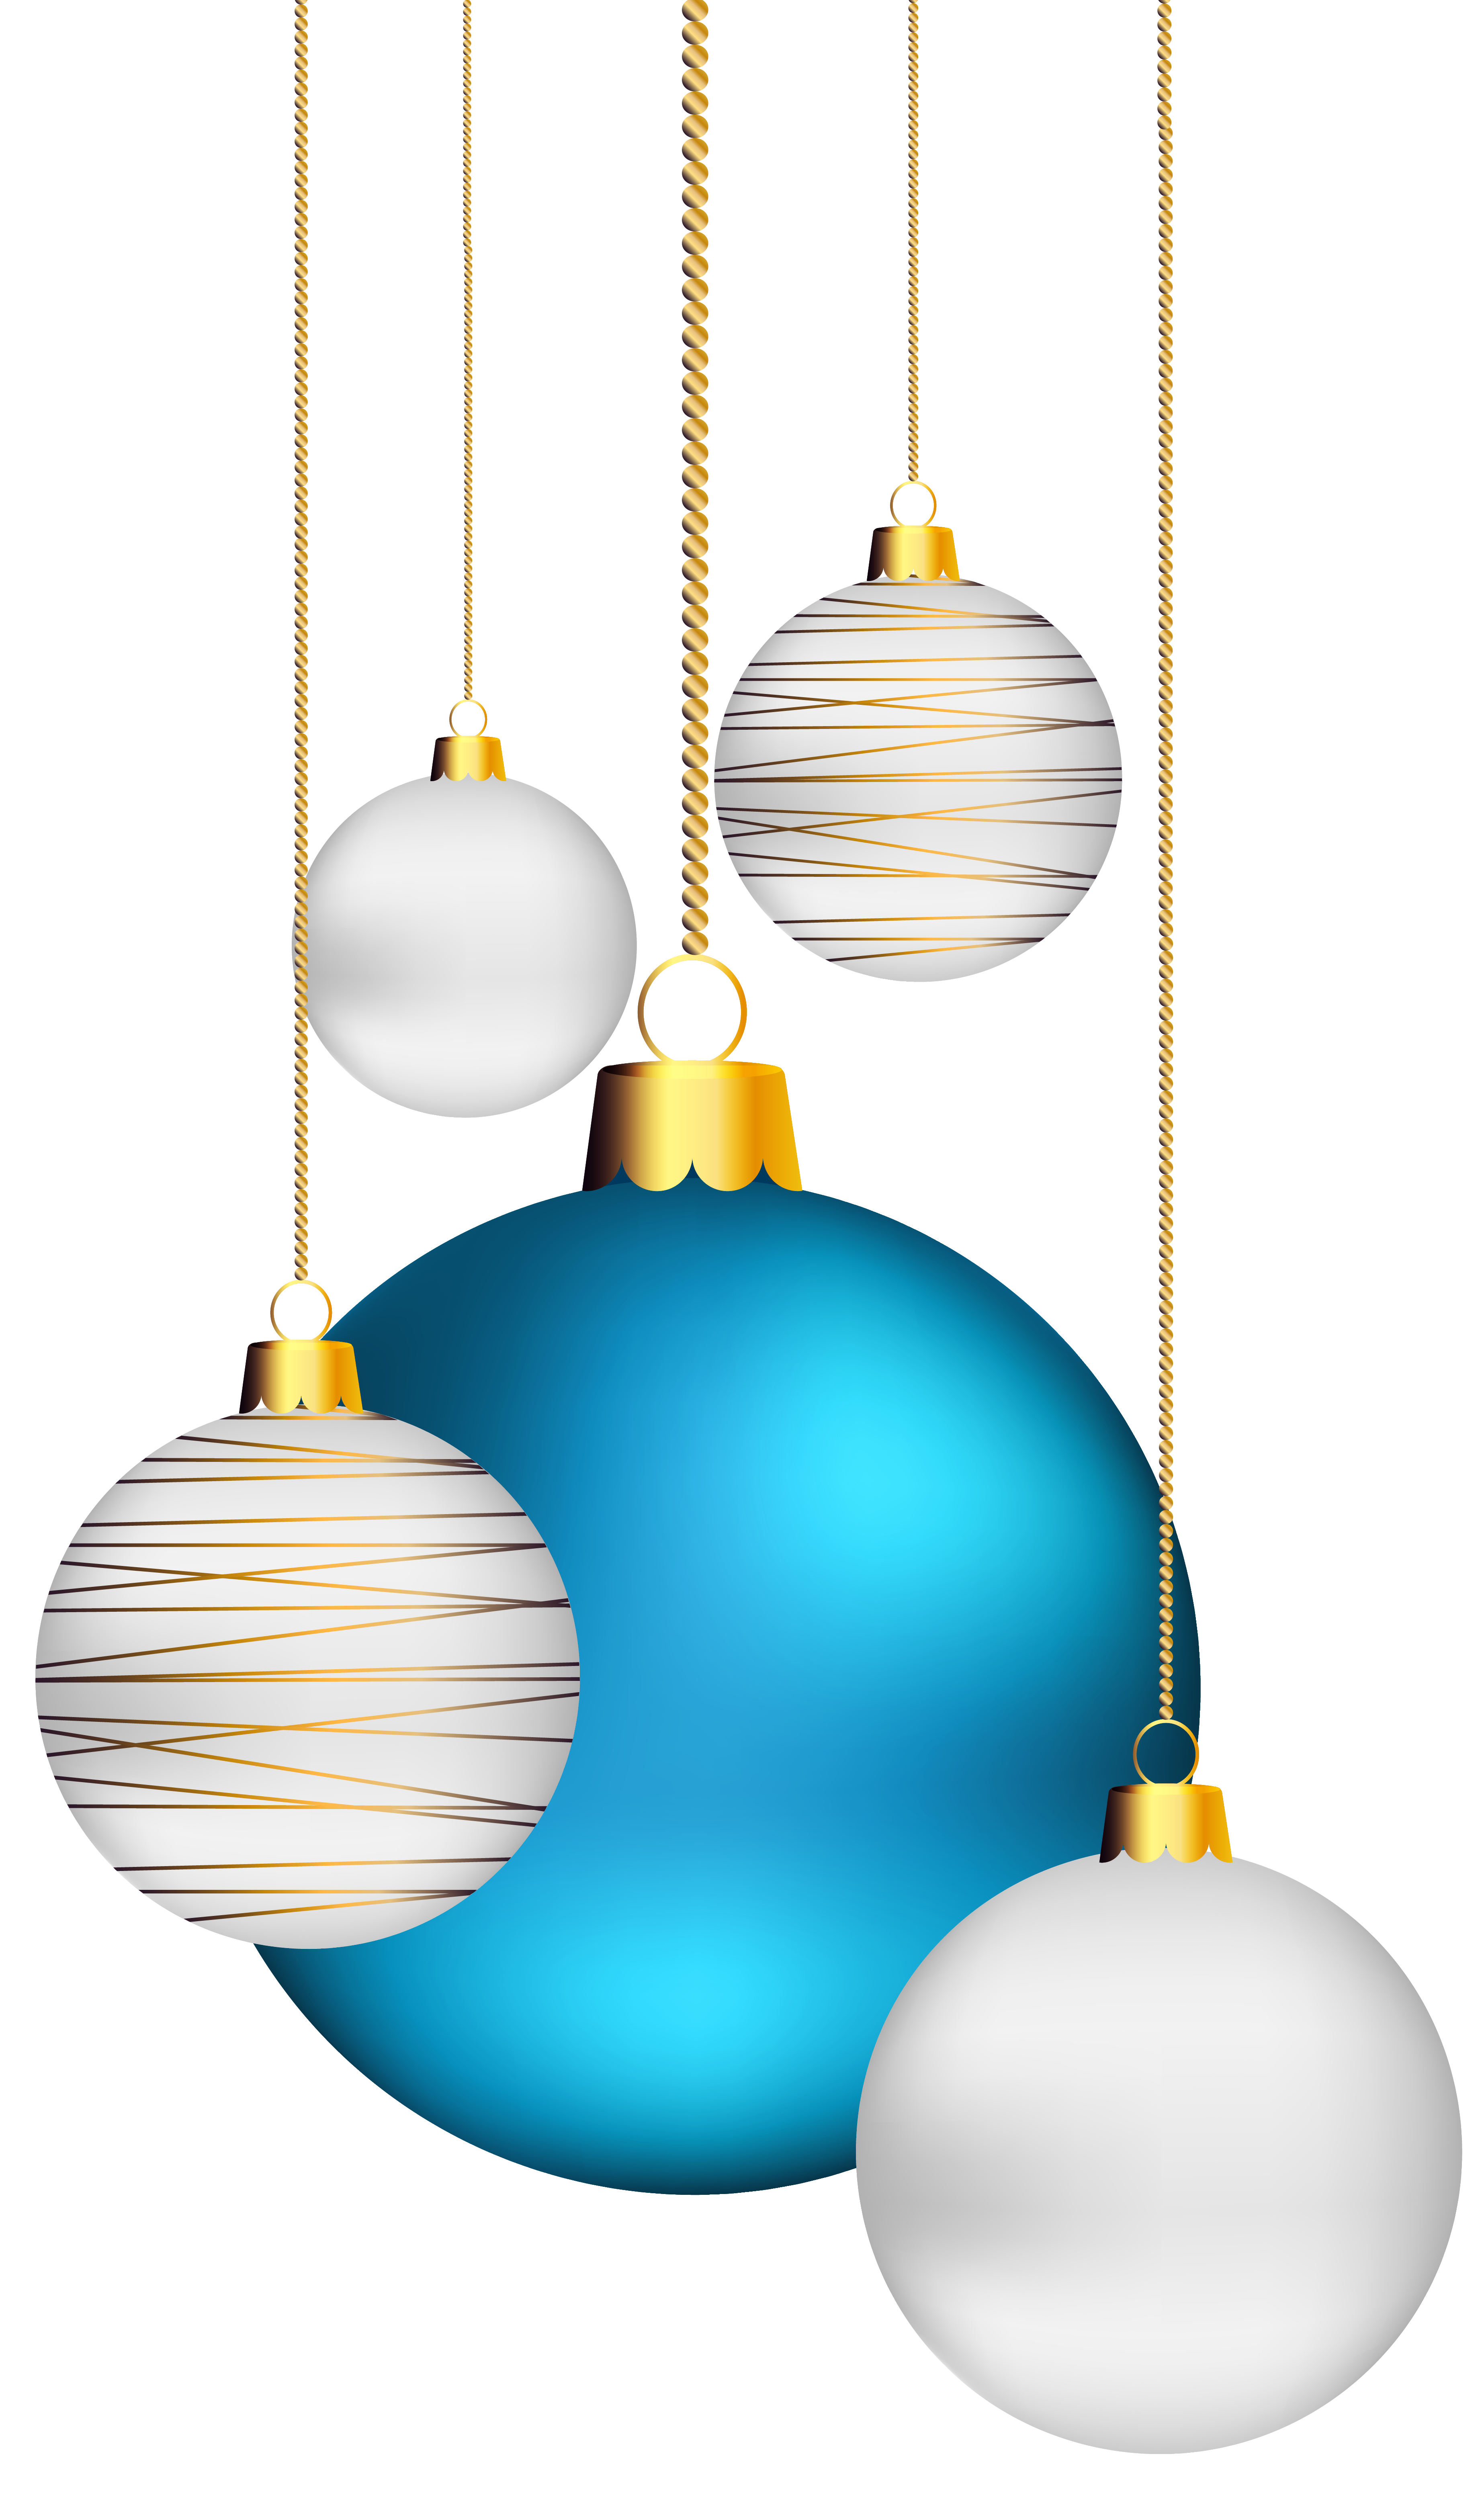 Balls transparent png clip. Crafts clipart christmas